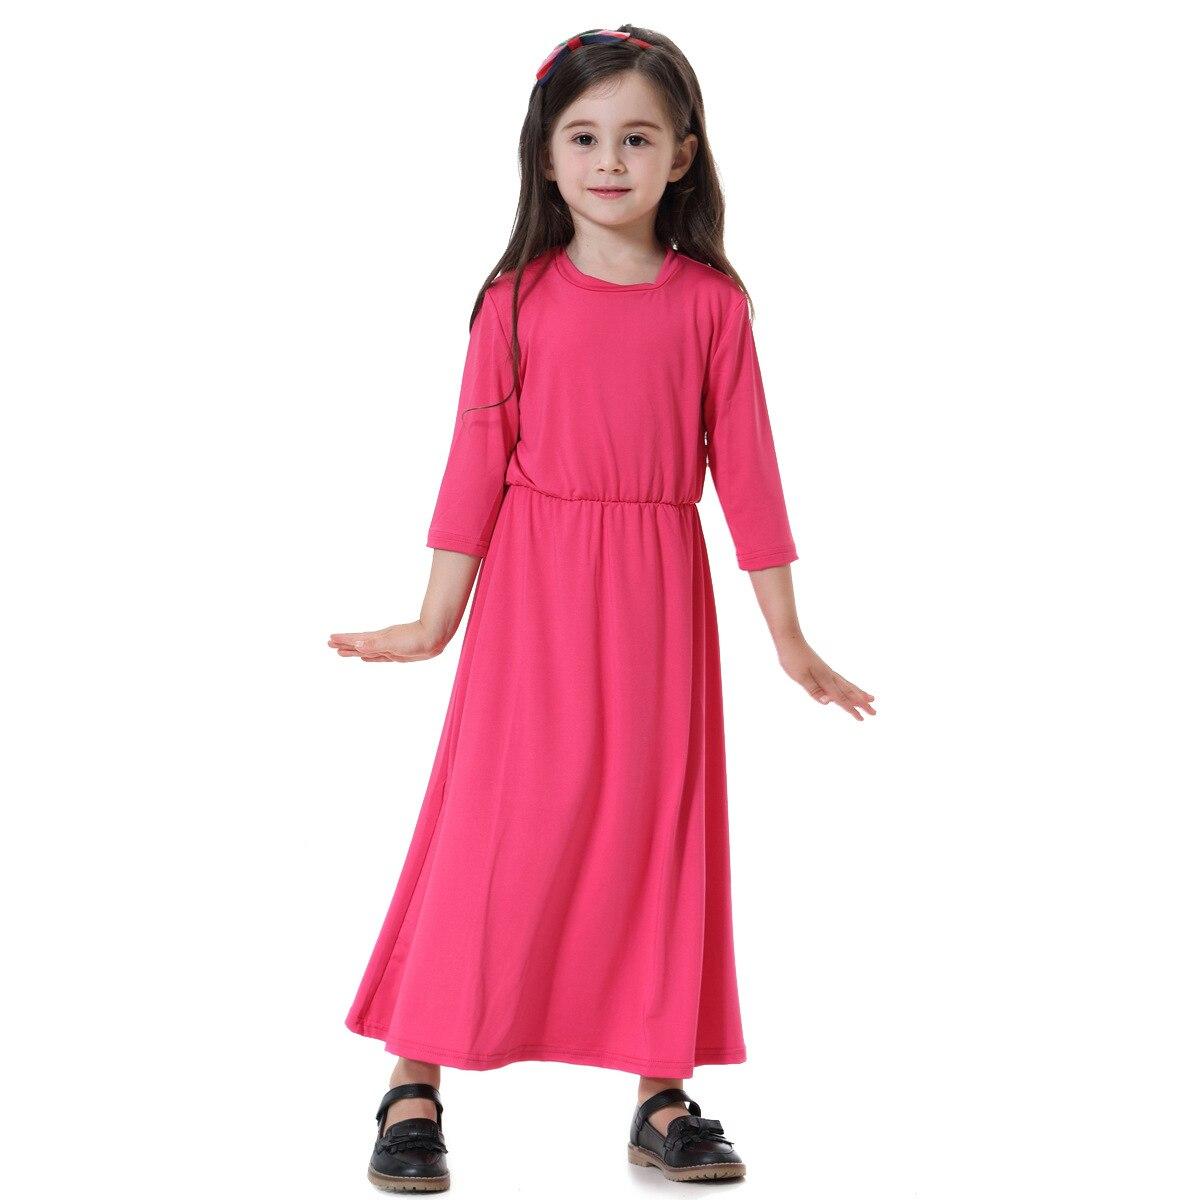 Baby Or Bigs Kids Girls Muslim Dress Traditional Soft Islamic Children Sandi Malaysia Kaftan Abaya School Dresses Summer Clothes